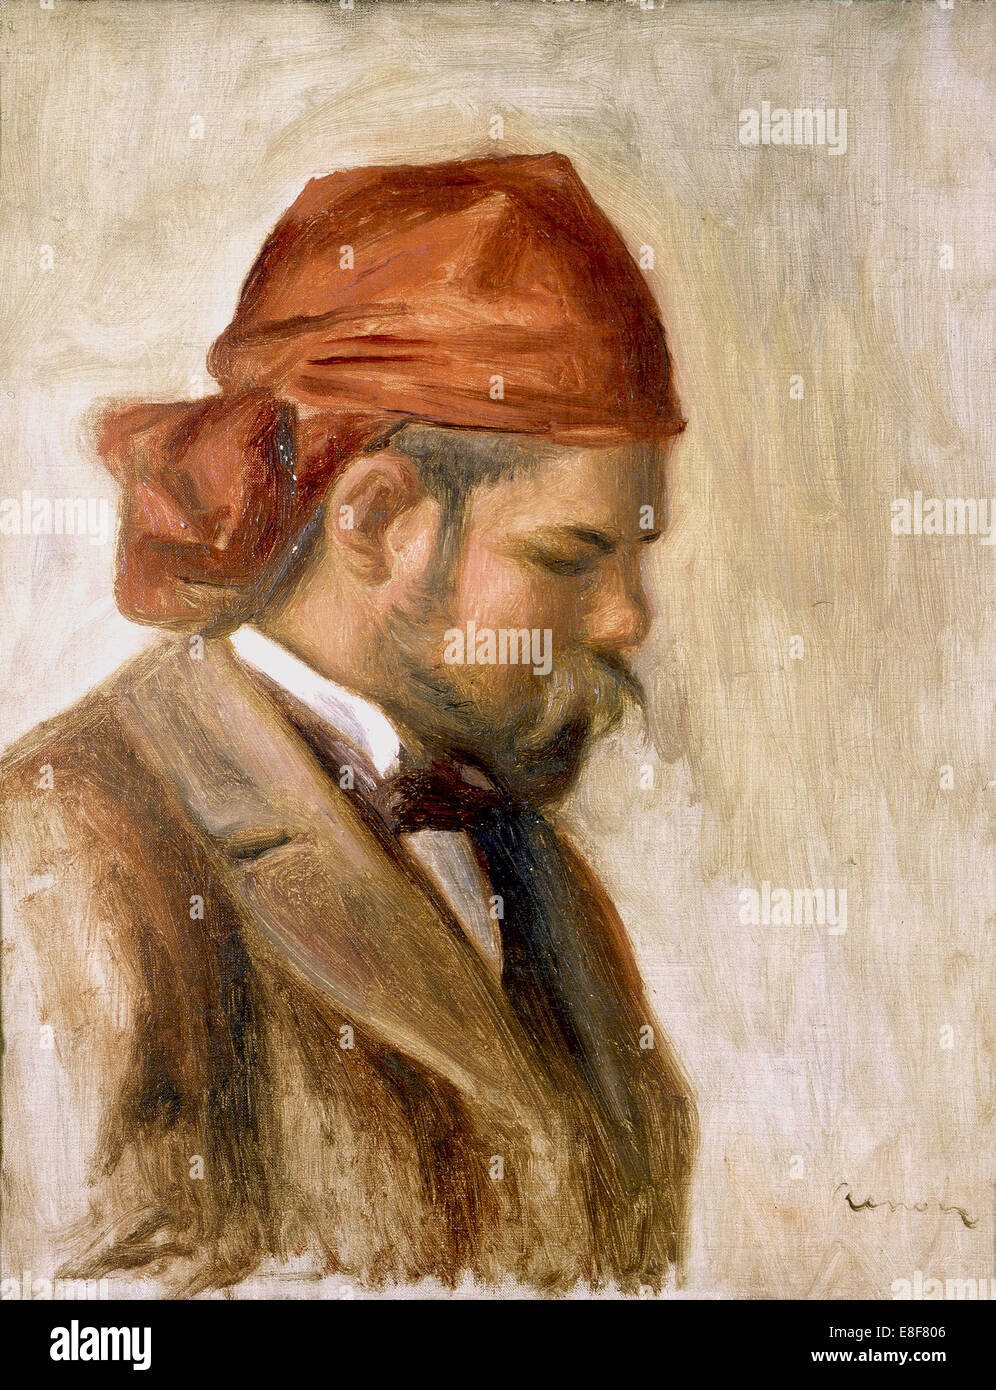 Ambroise Vollard in a Red Bandana. Artist: Renoir, Pierre Auguste (1841-1919) - Stock Image